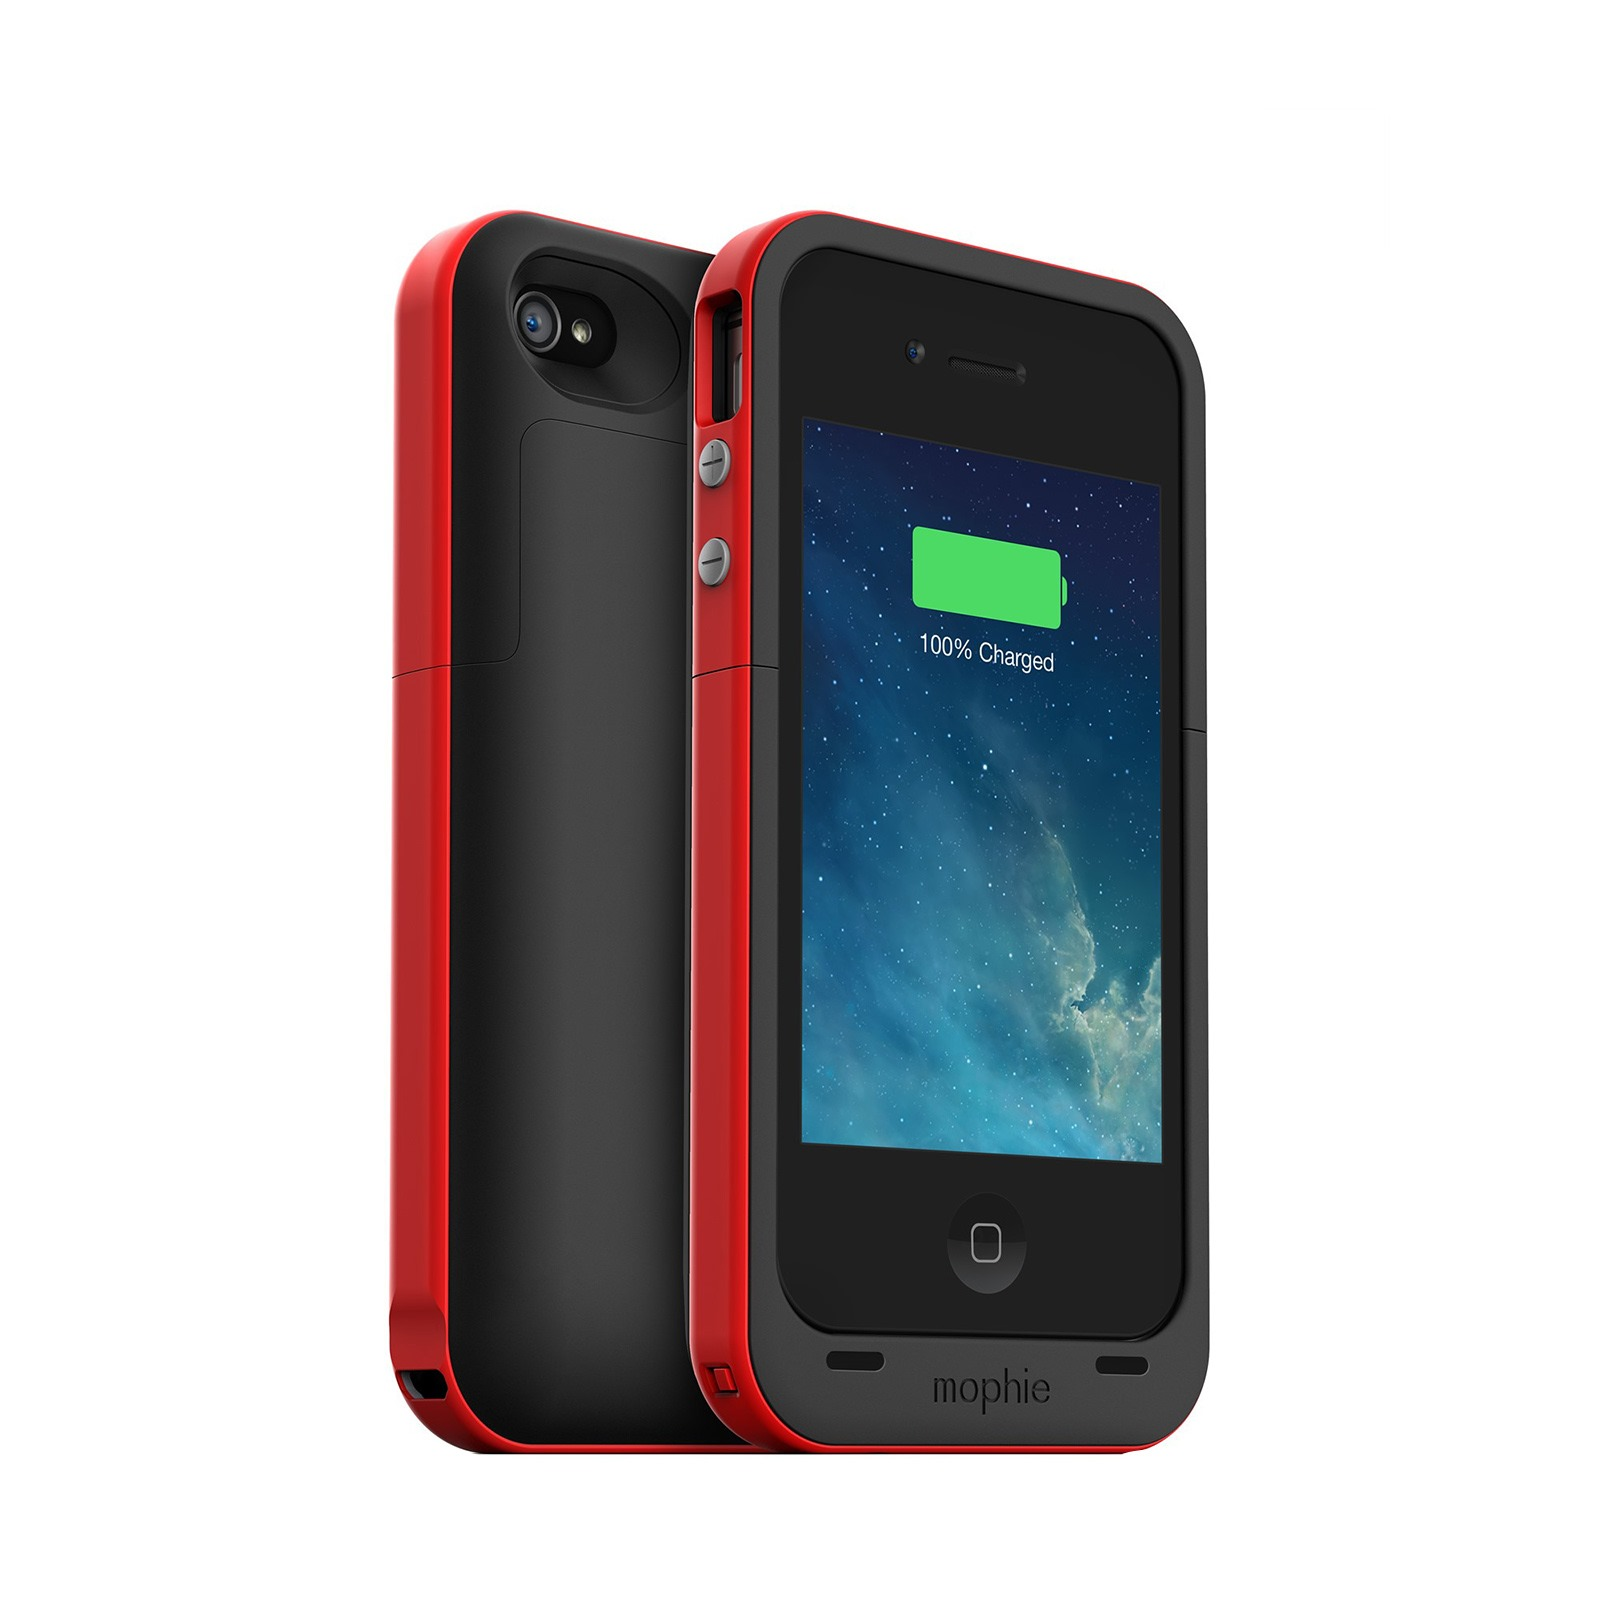 mophie juice pack plus recharegeable battery case for iphone 4s 4 2000 mah ebay. Black Bedroom Furniture Sets. Home Design Ideas